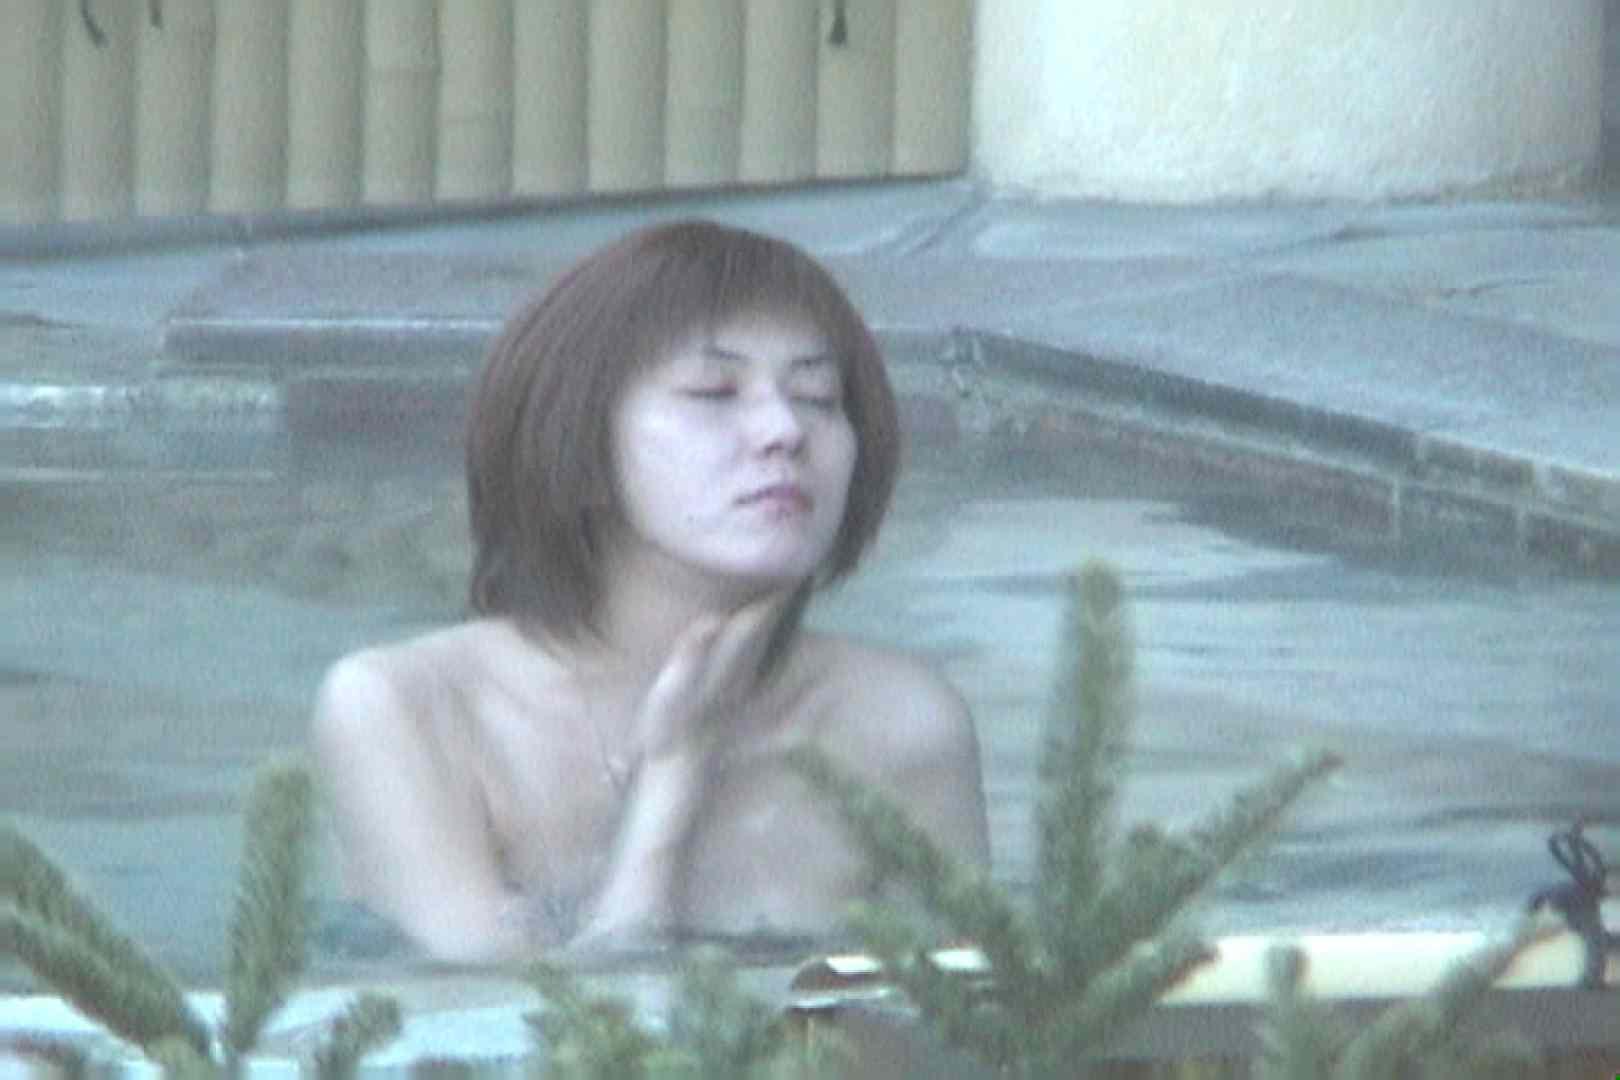 Aquaな露天風呂Vol.560 露天 | HなOL  62pic 29